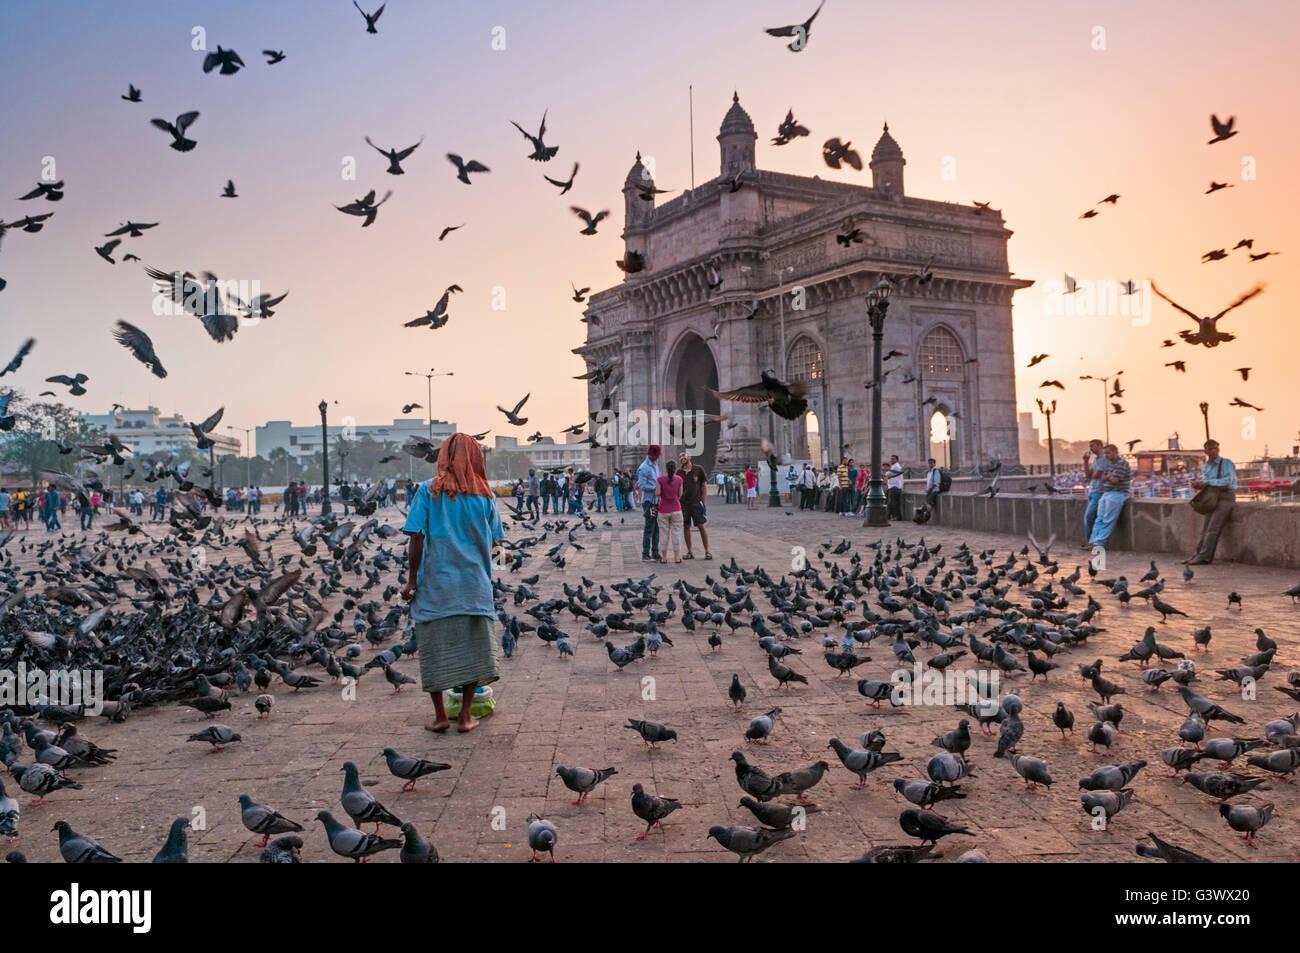 Porte de l'Inde Mumbai Bombay Inde Photo Stock